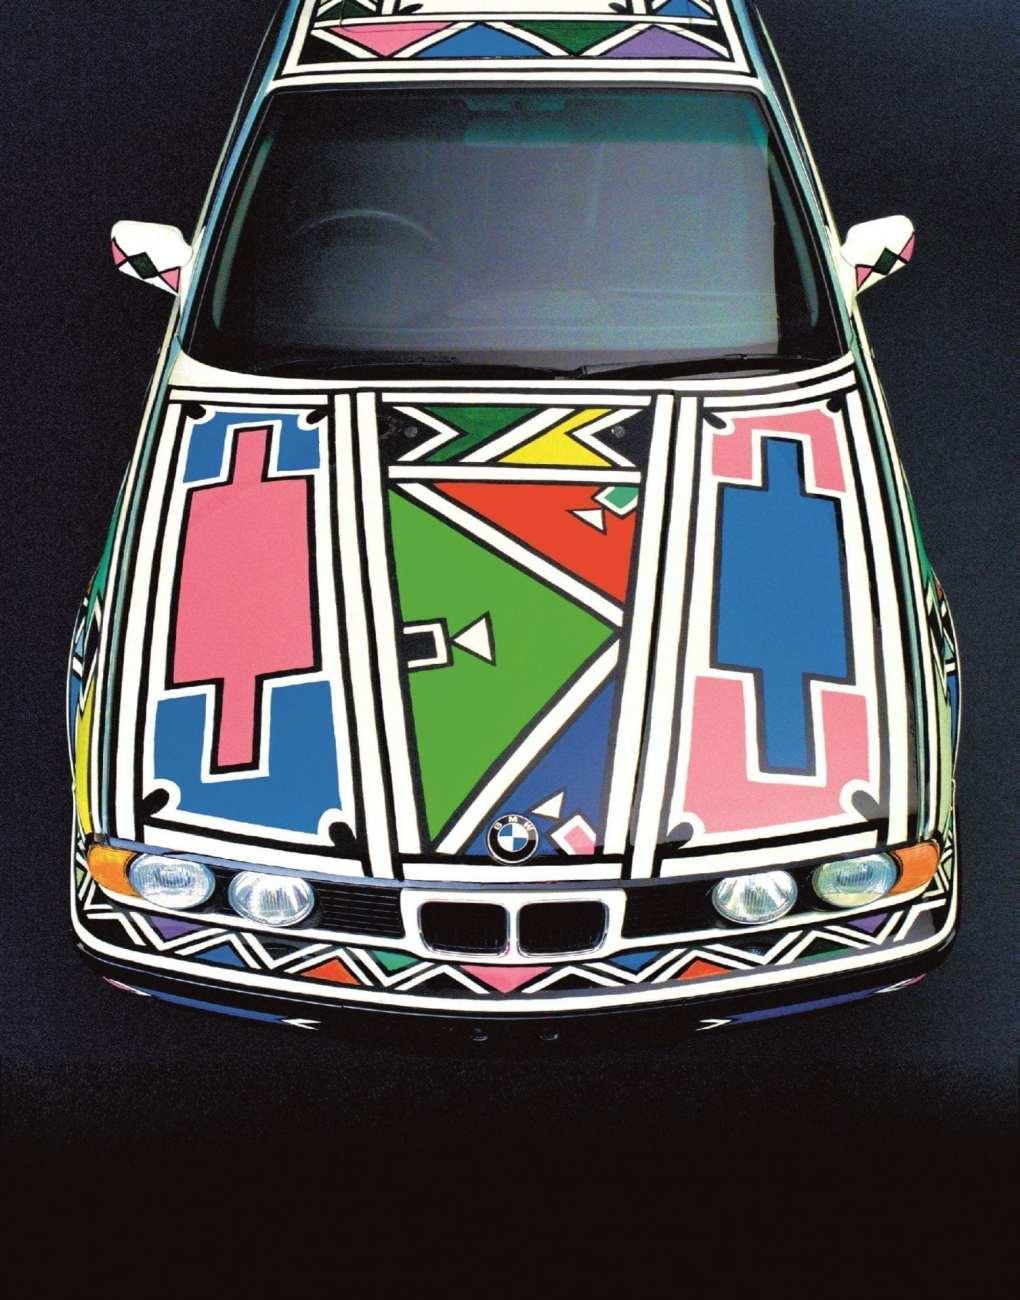 british-museum_bmw-art-car-12-199112902